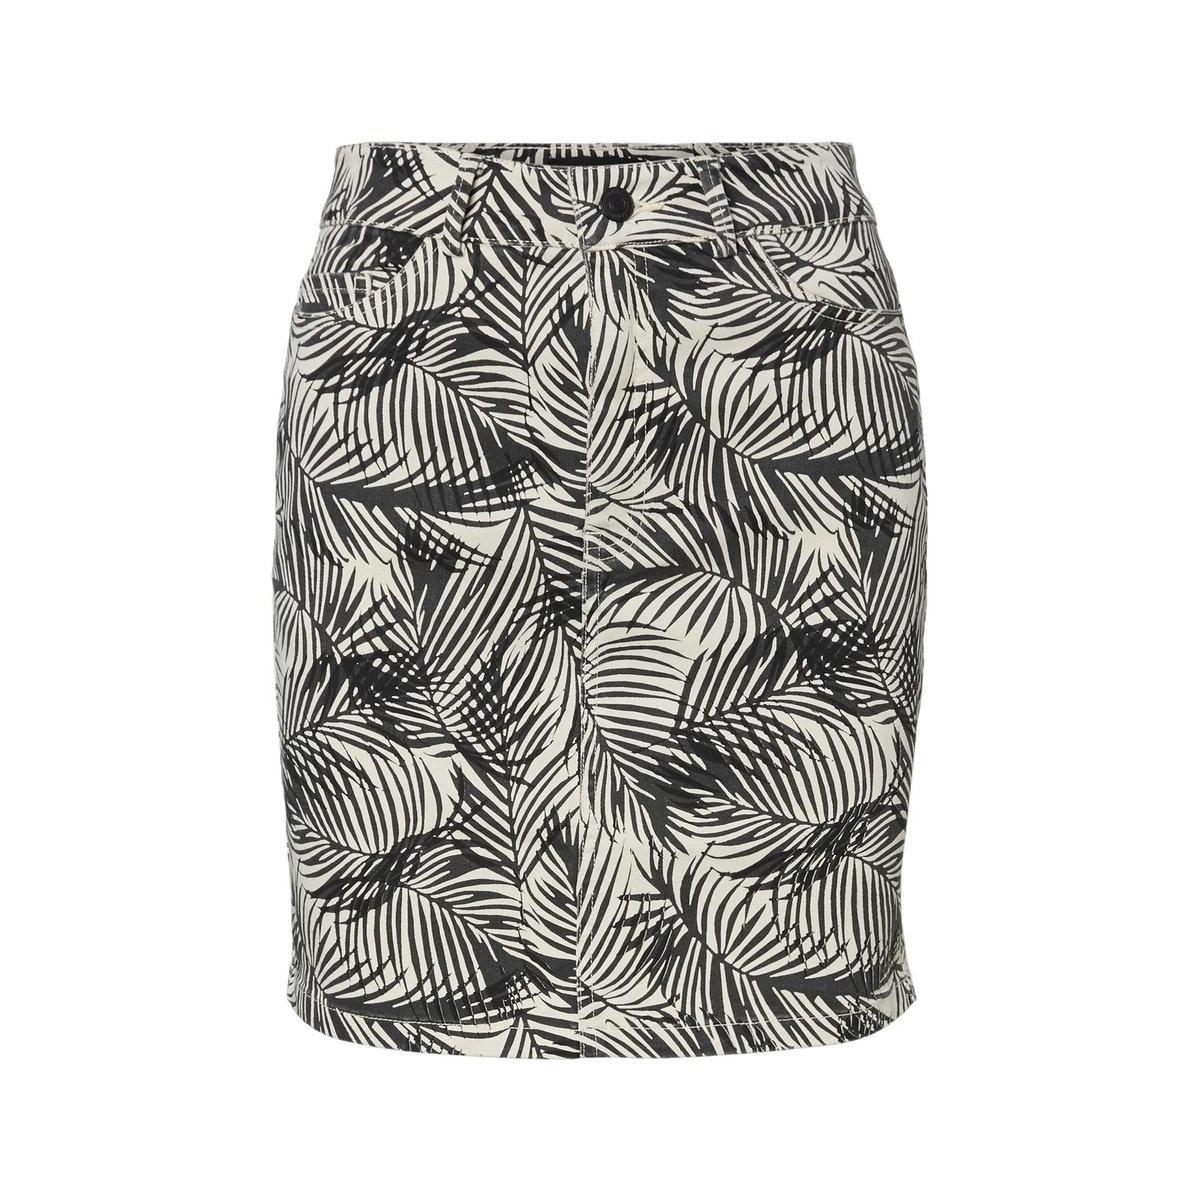 vmleonora mr palm short denim skirt 10231244 vero moda rok birch/phantom/black